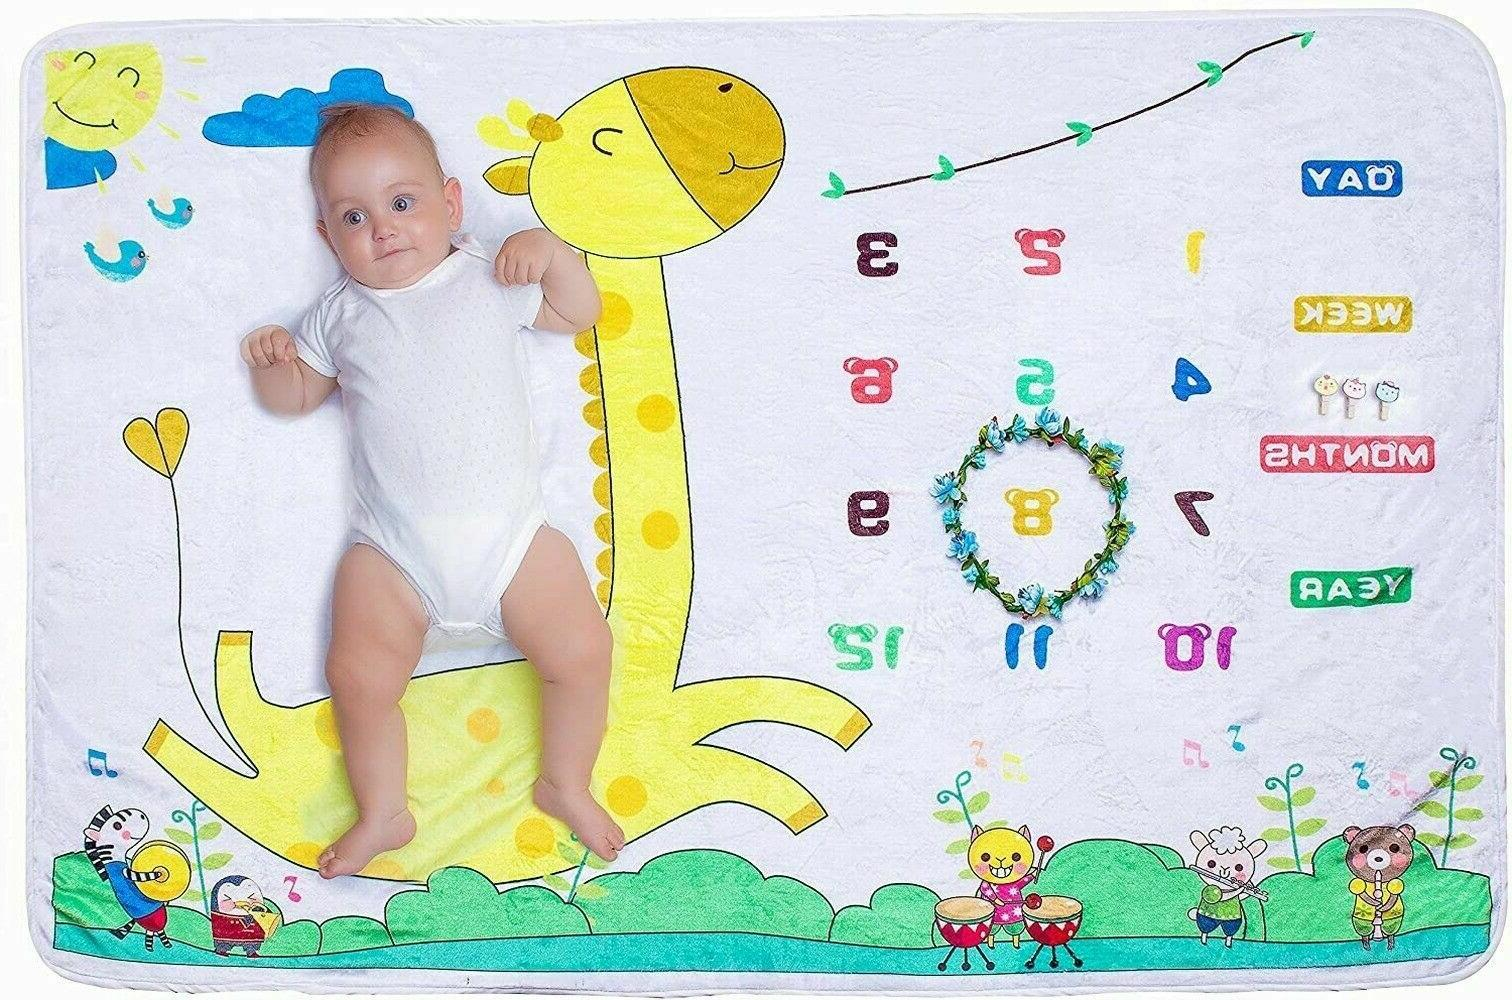 US Baby Shower Mat Milestone Blanket gift Photography Prop M